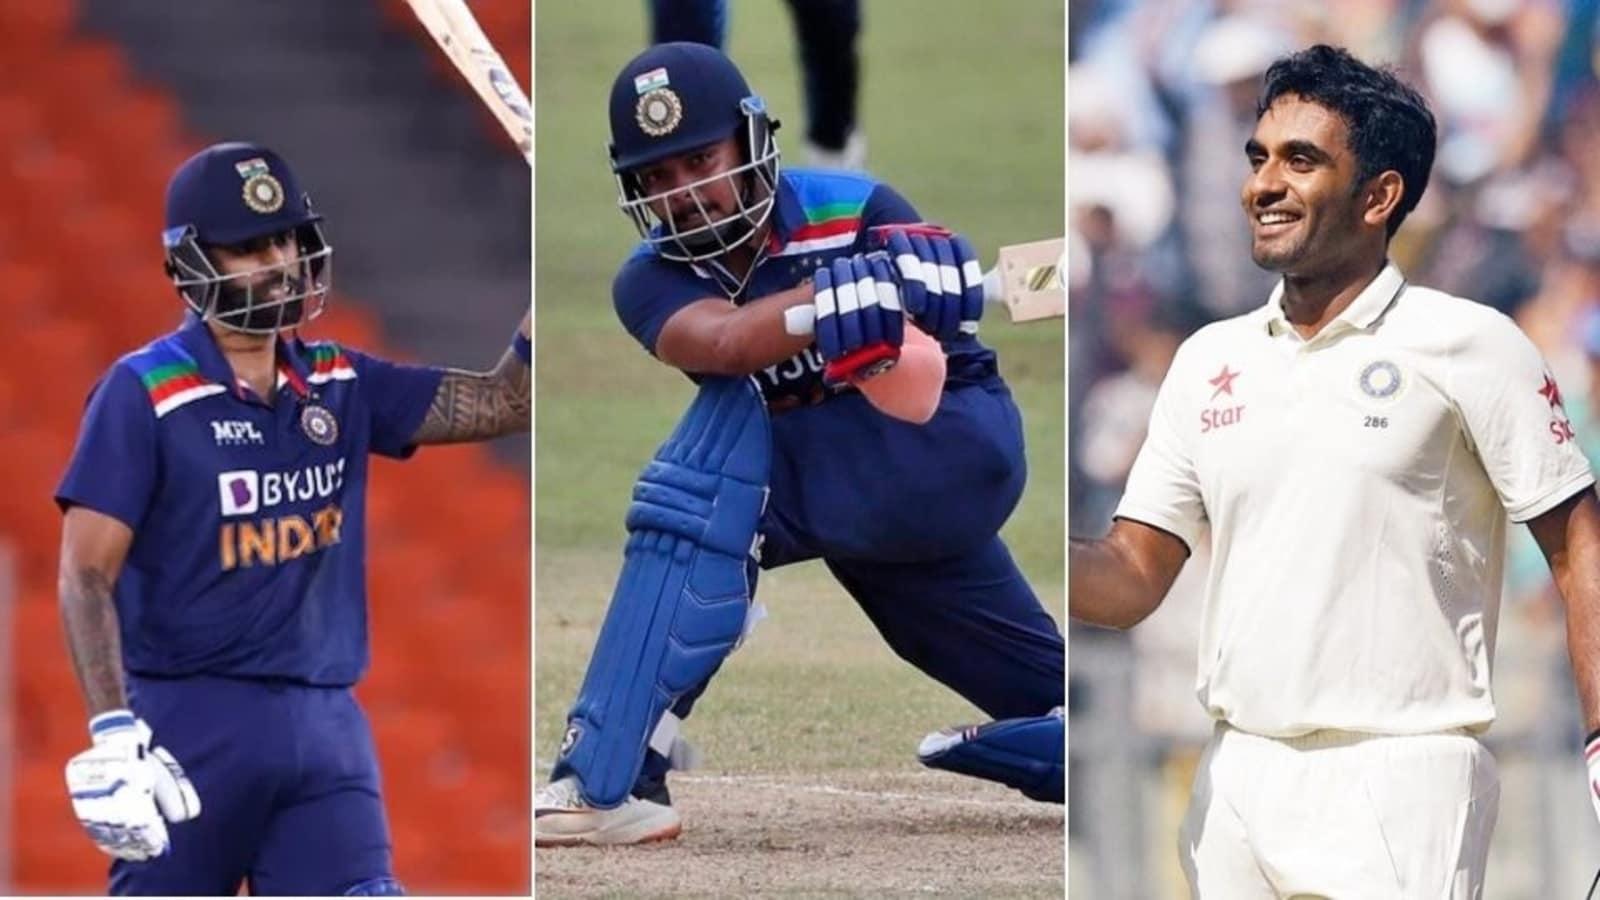 Suryakumar Yadav, Prithvi Shaw and Jayant Yadav going to England as  replacements, reports PTI   Cricket - Hindustan Times